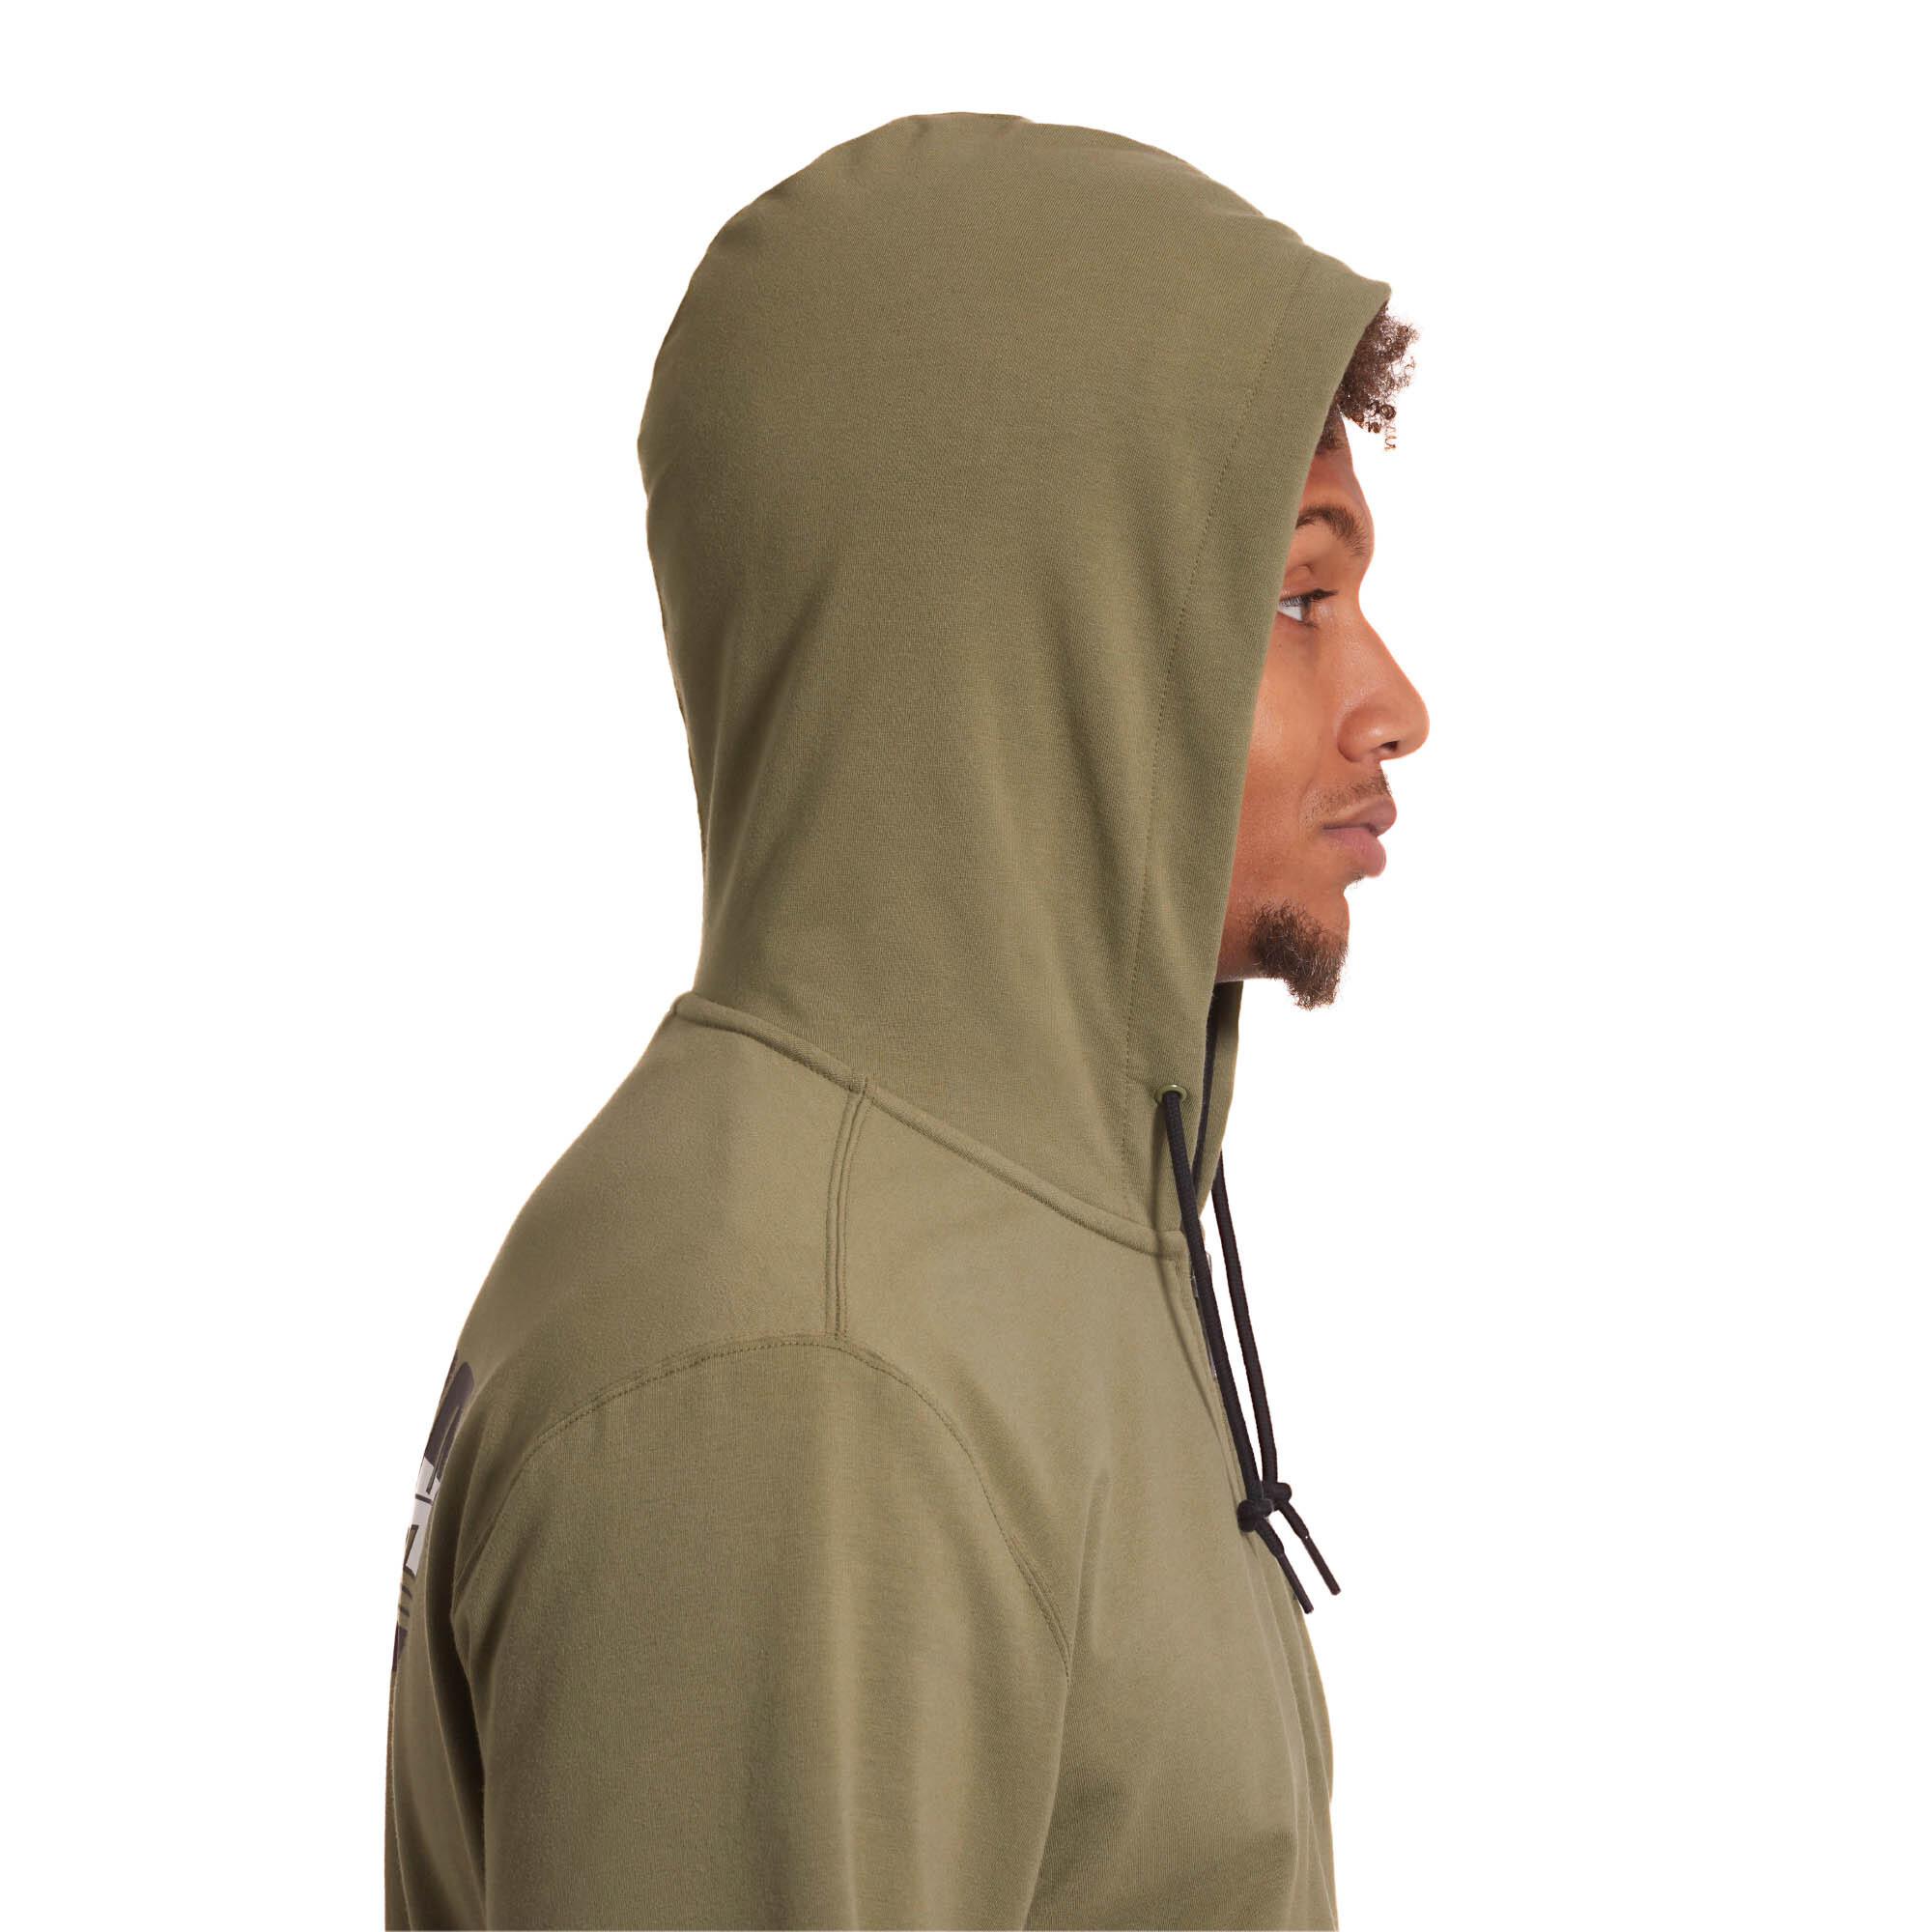 PUMA-Rebel-Men-s-Hooded-Jacket-Men-Sweat-Basics miniatura 4